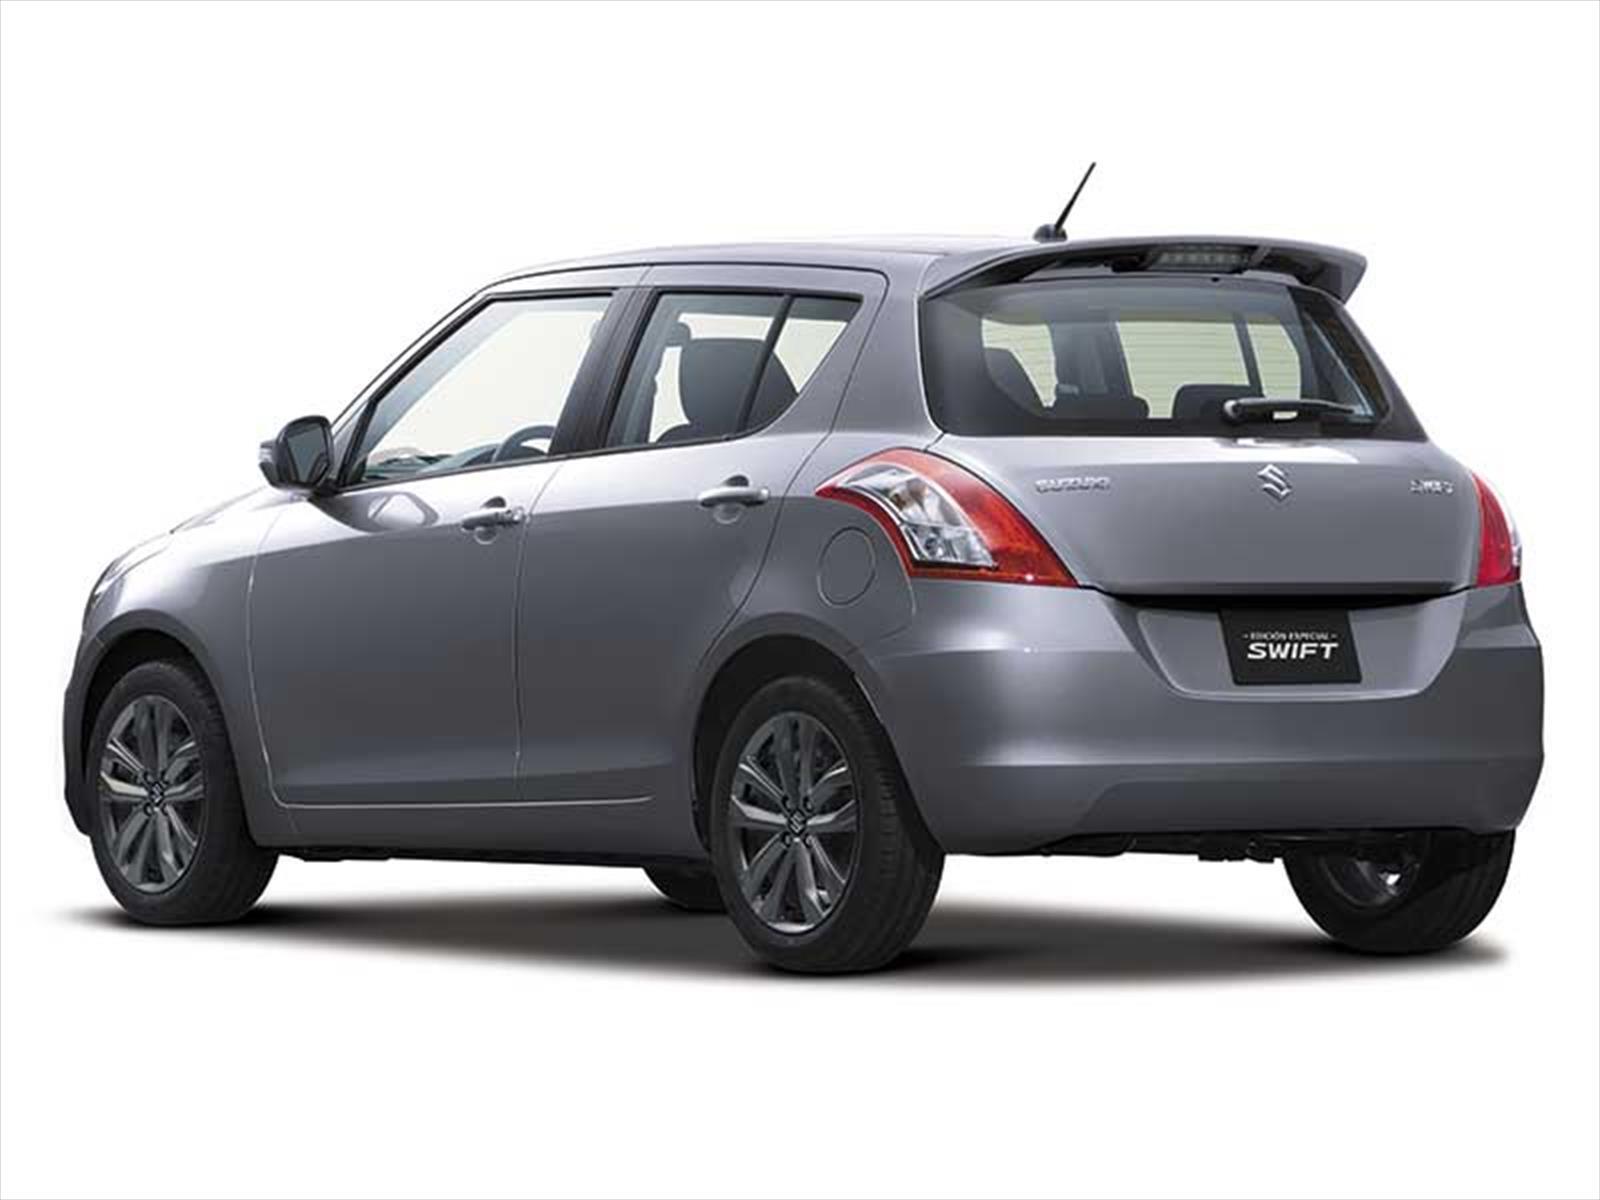 Suzuki Swift Manual